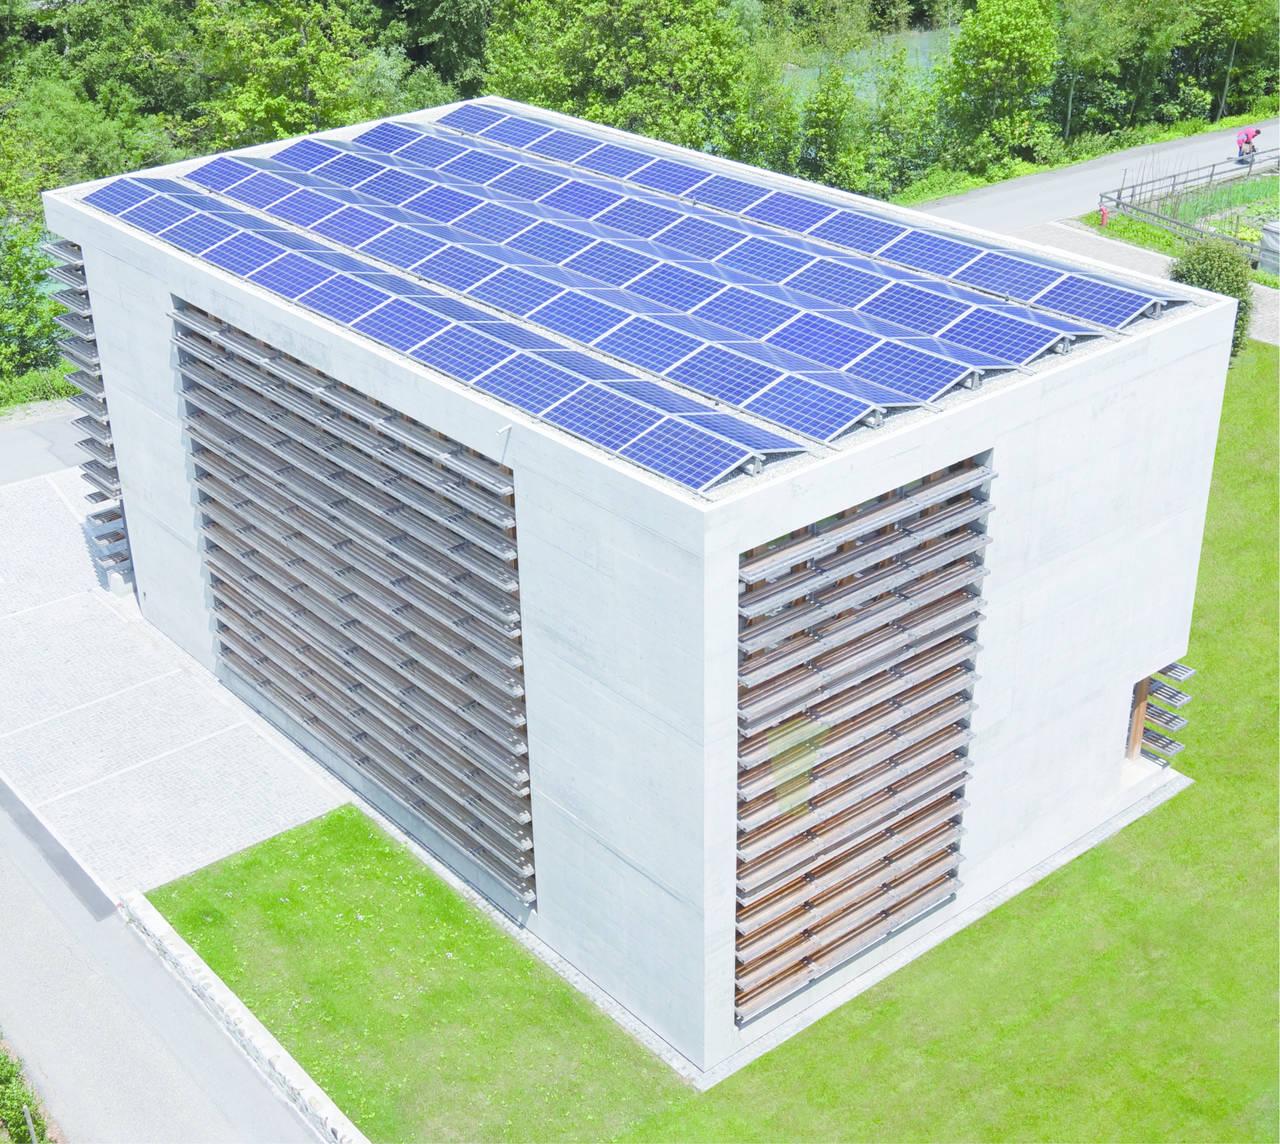 Monolith, vincitore del Norman Foster Solar Award 2015